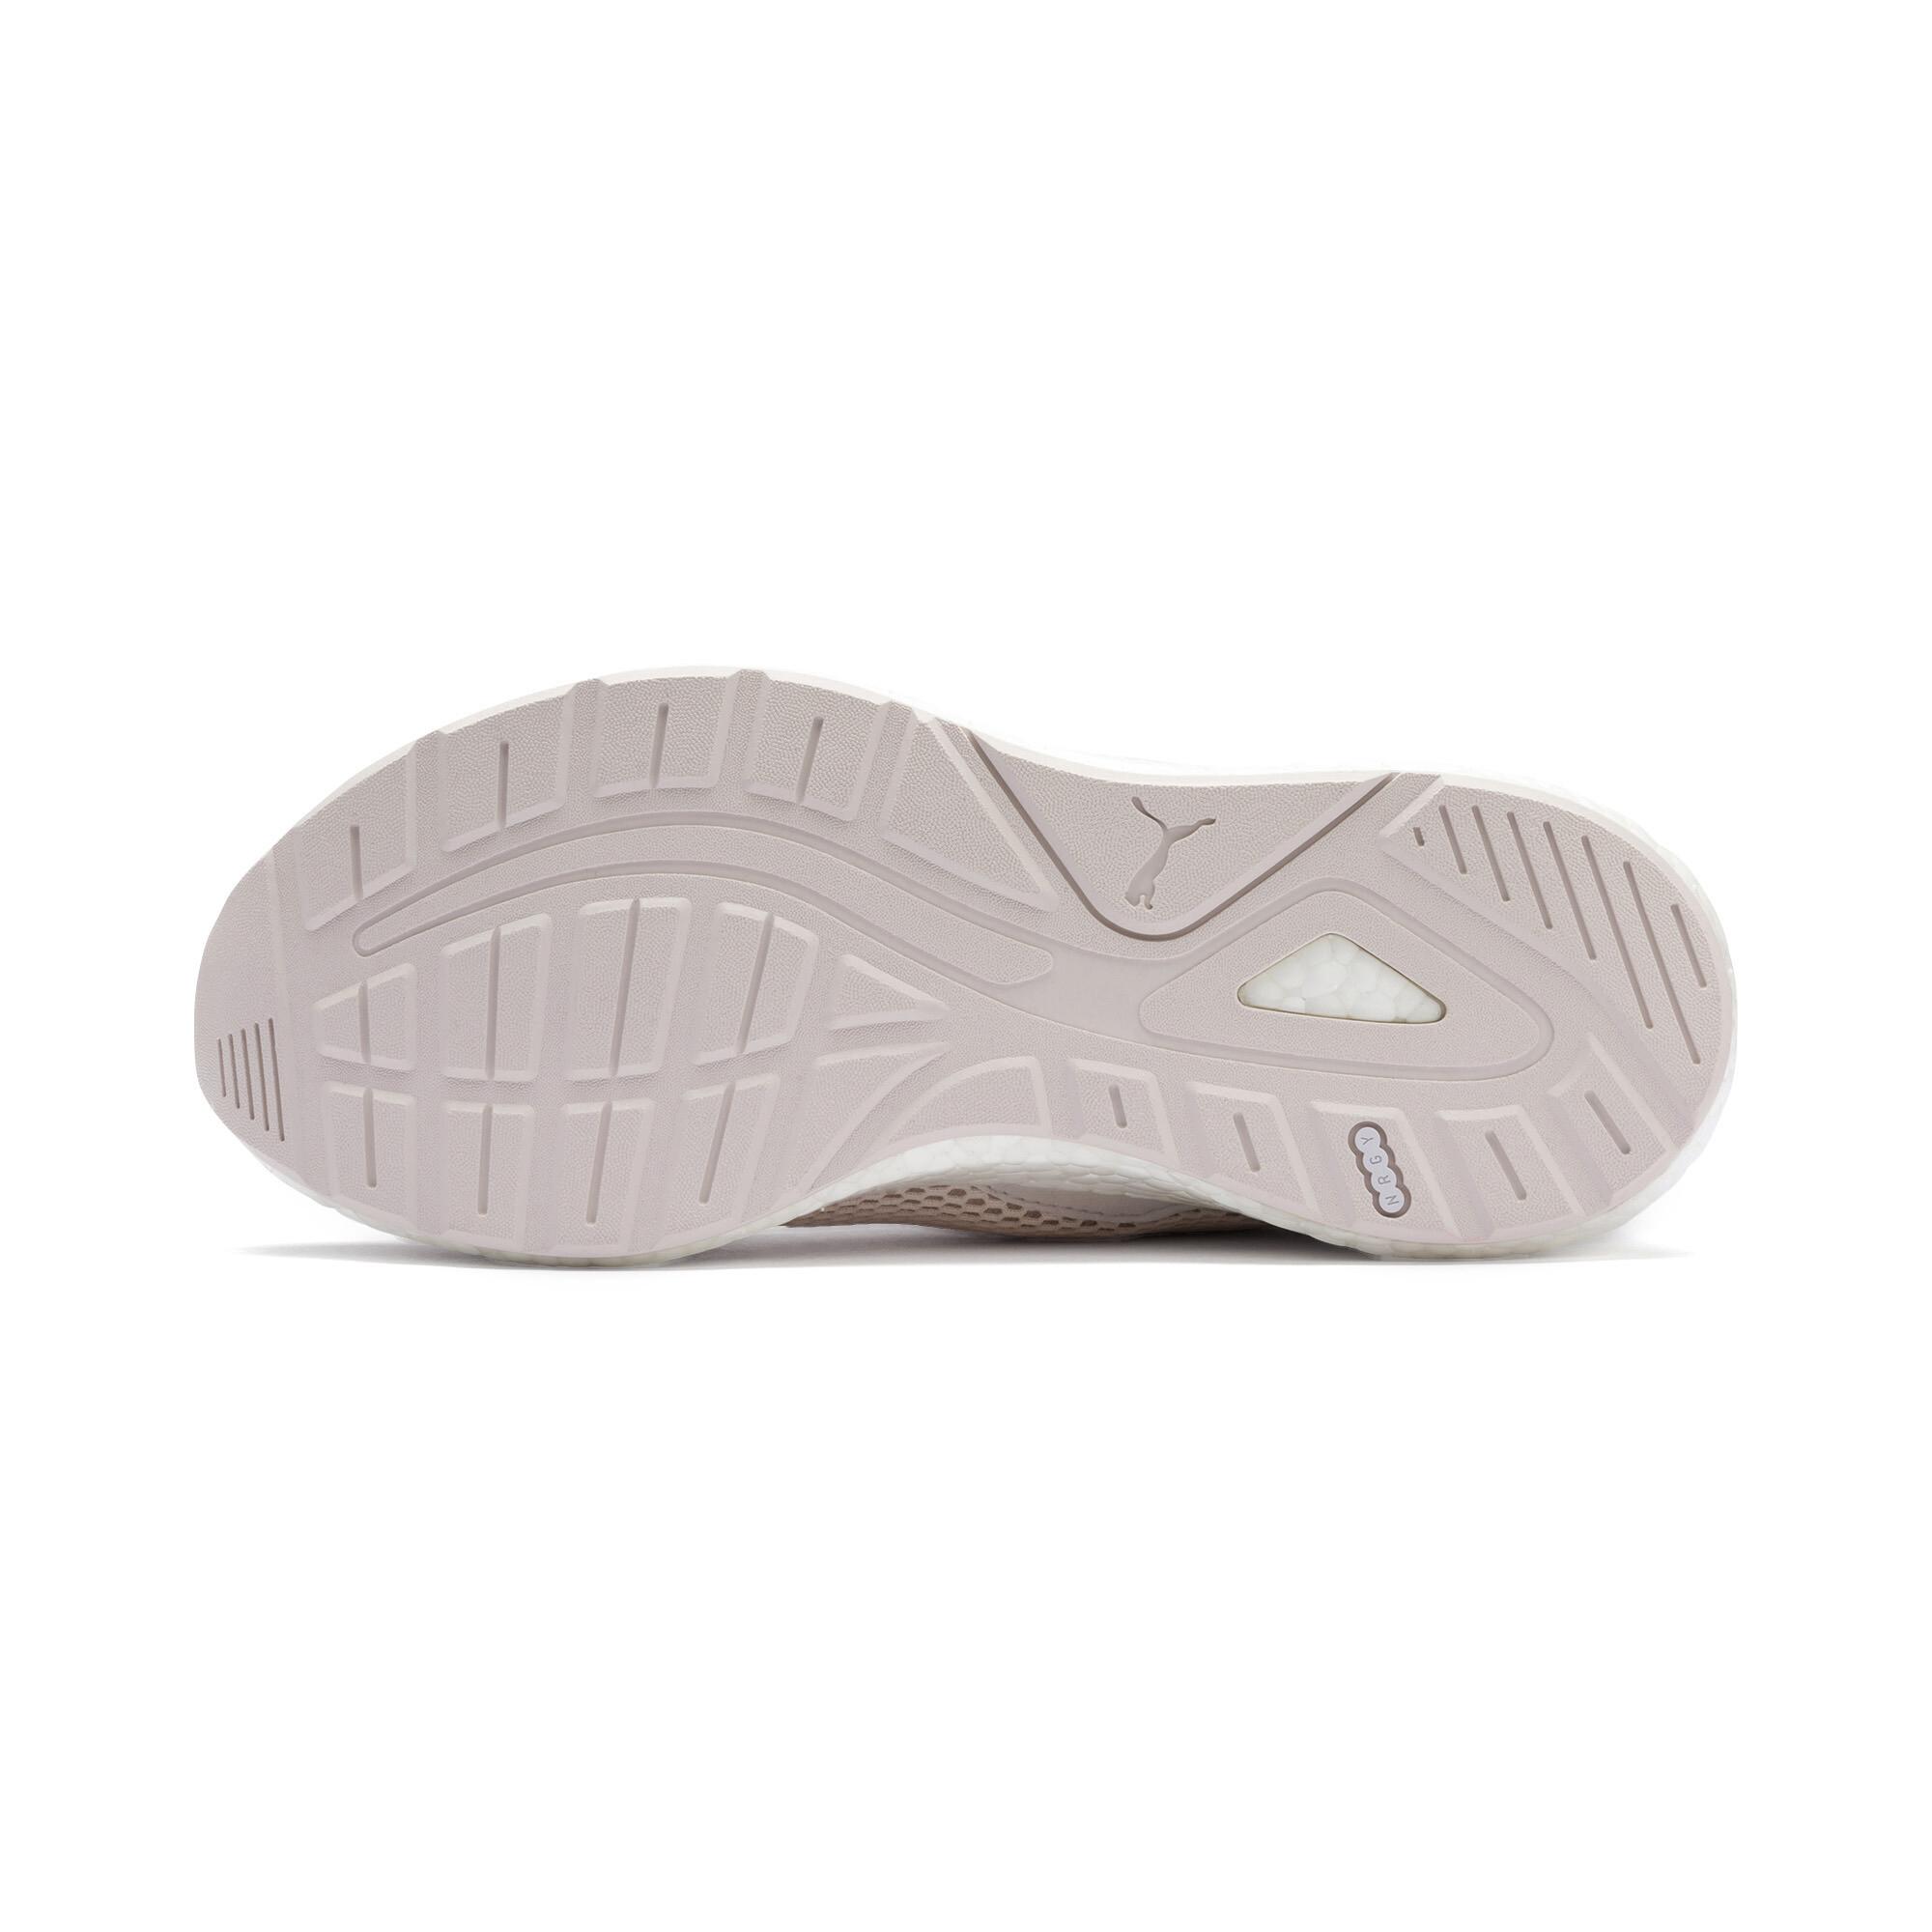 PUMA-Women-039-s-NRGY-Neko-Skim-Running-Shoes thumbnail 20